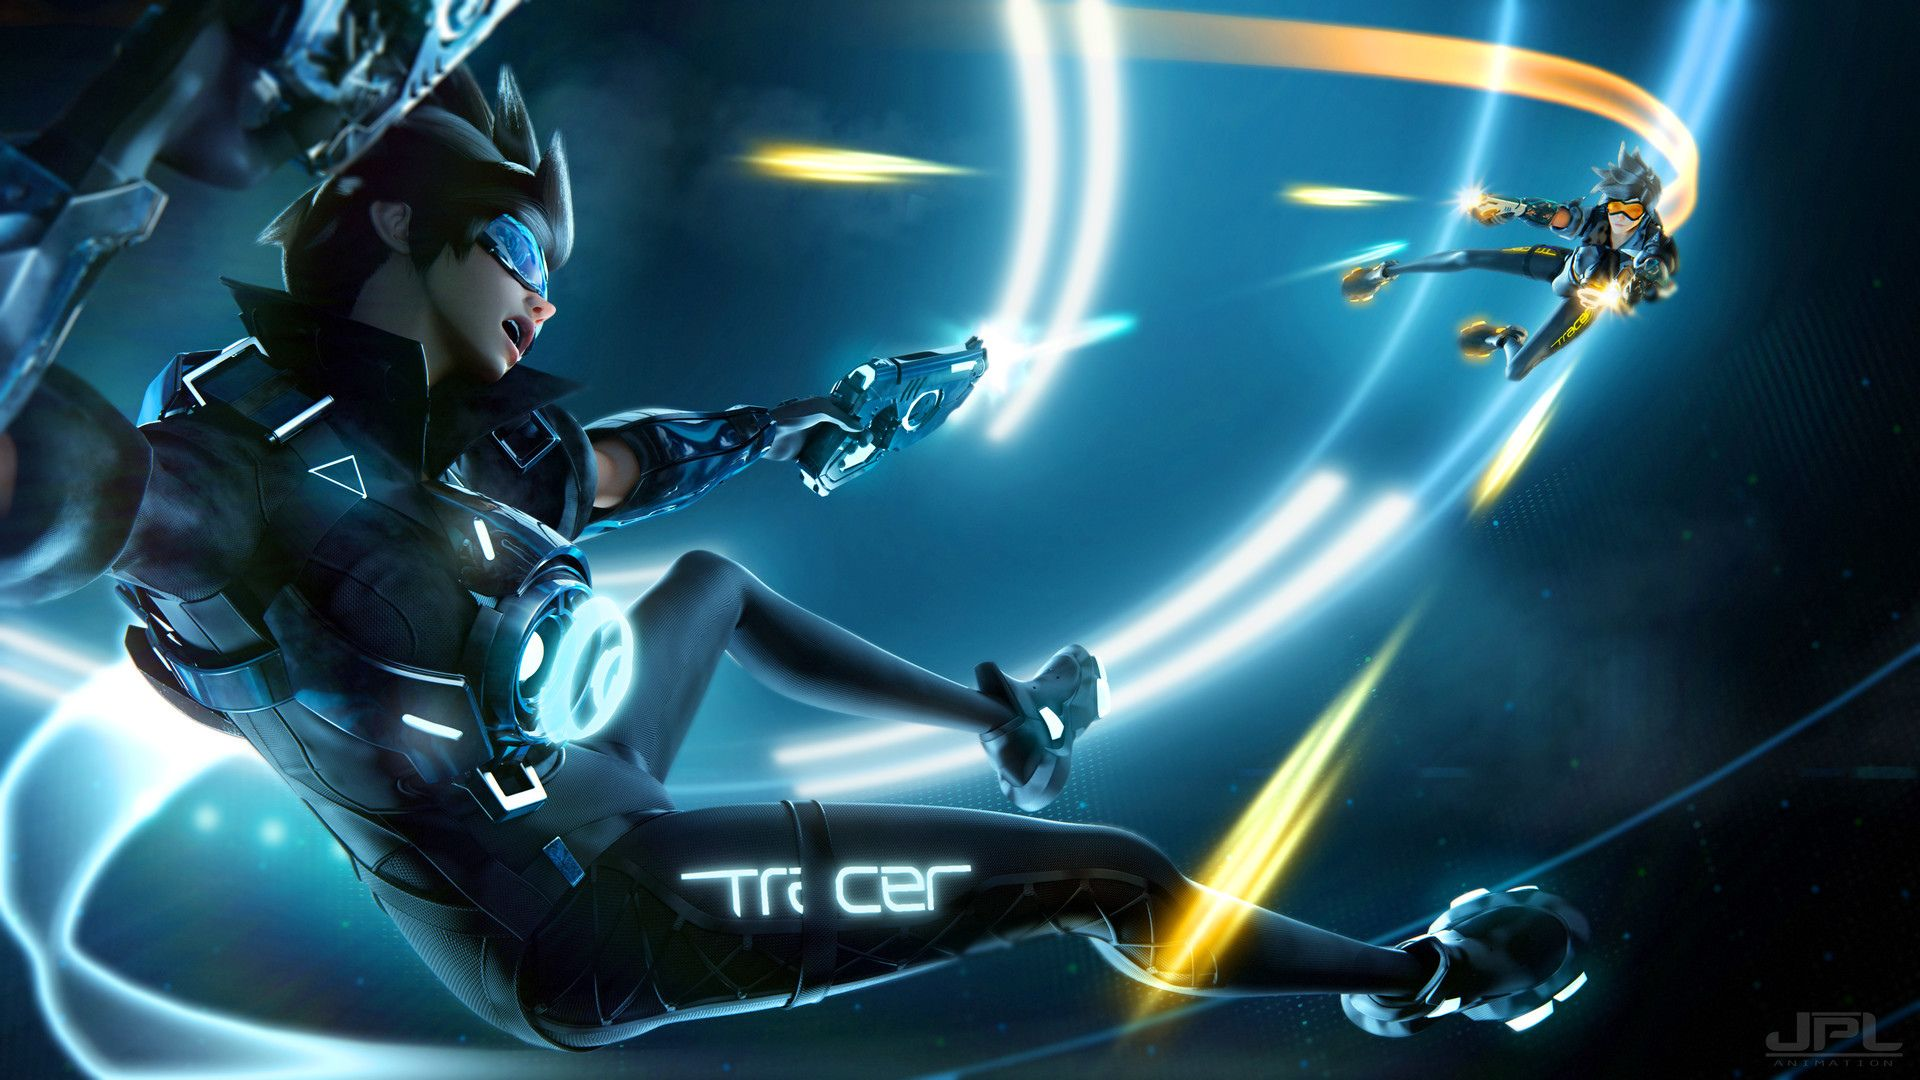 Video Game Overwatch Tracer (Overwatch) Wallpaper | 歌い手 ...